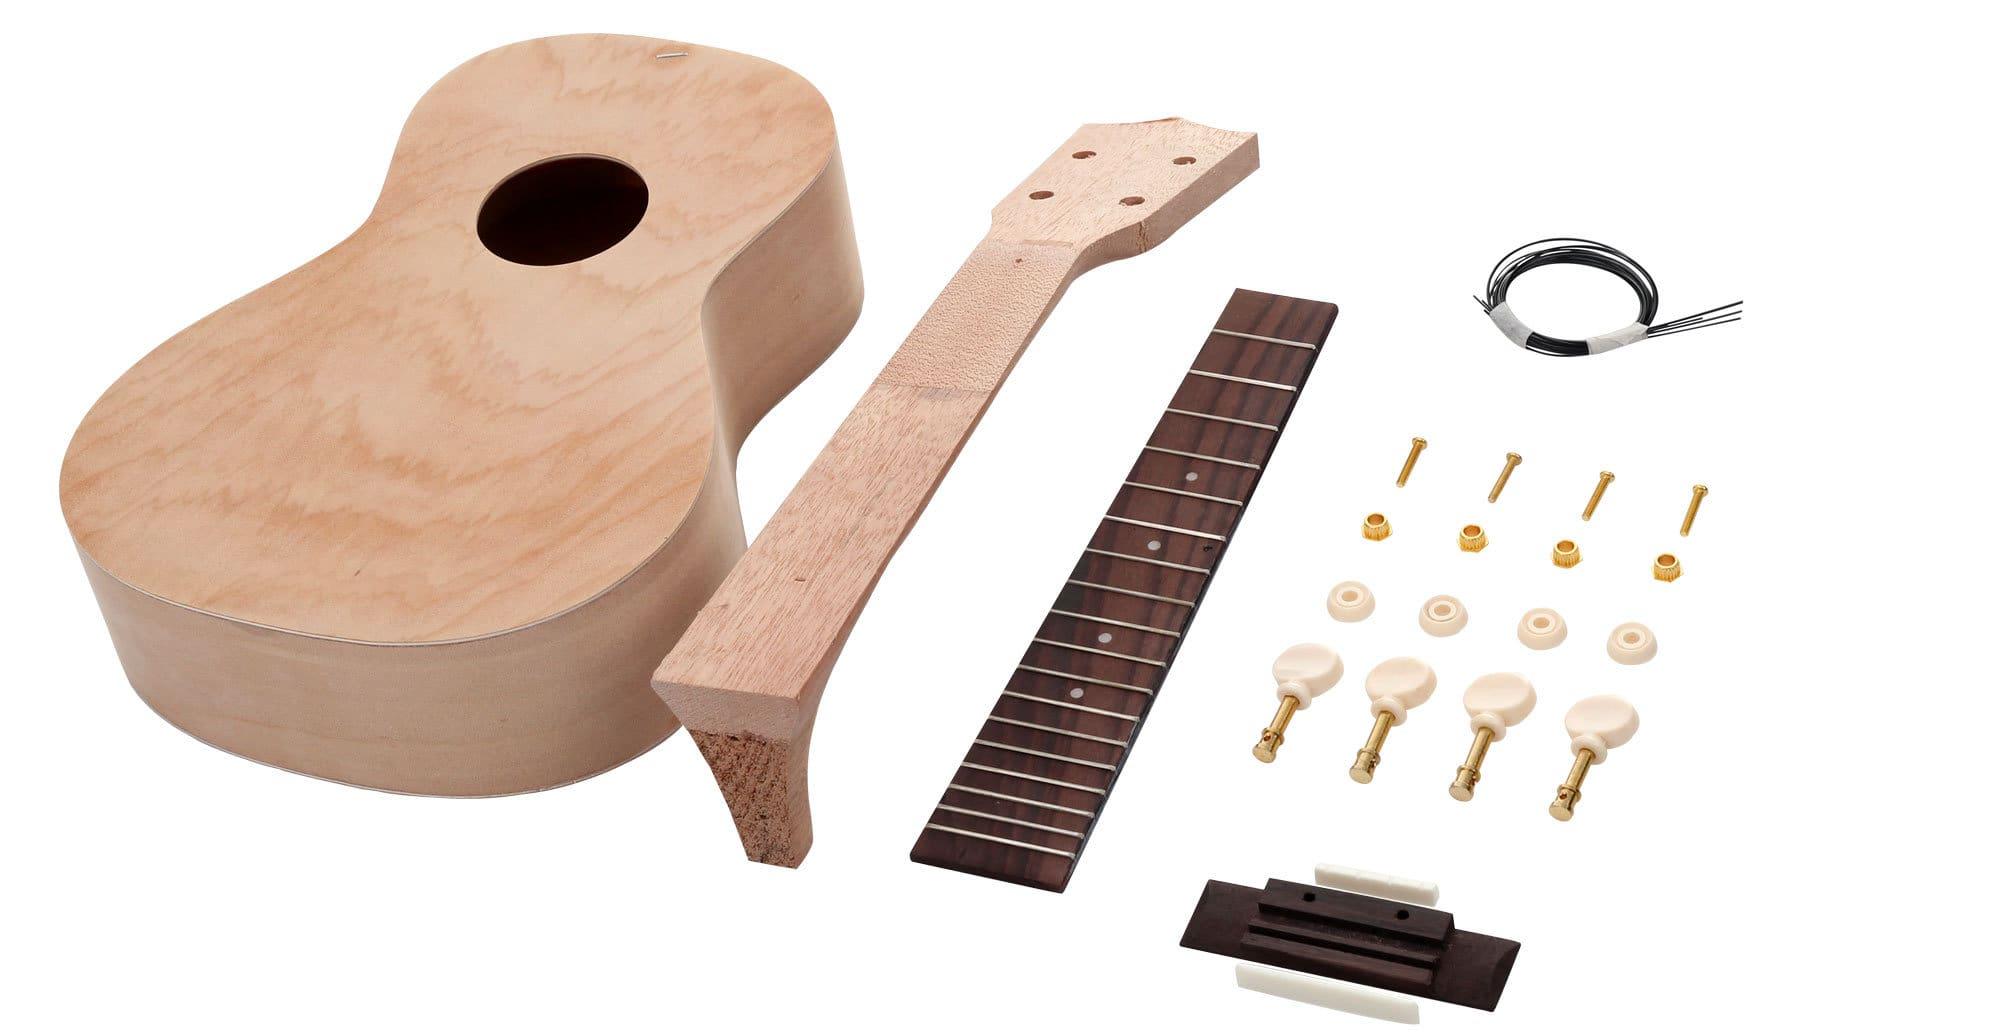 Classic cantabile uc 240 diy ukulele bausatz konzert classic cantabile uc 240 diy ukulele bausatz konzert icon 1 solutioingenieria Gallery